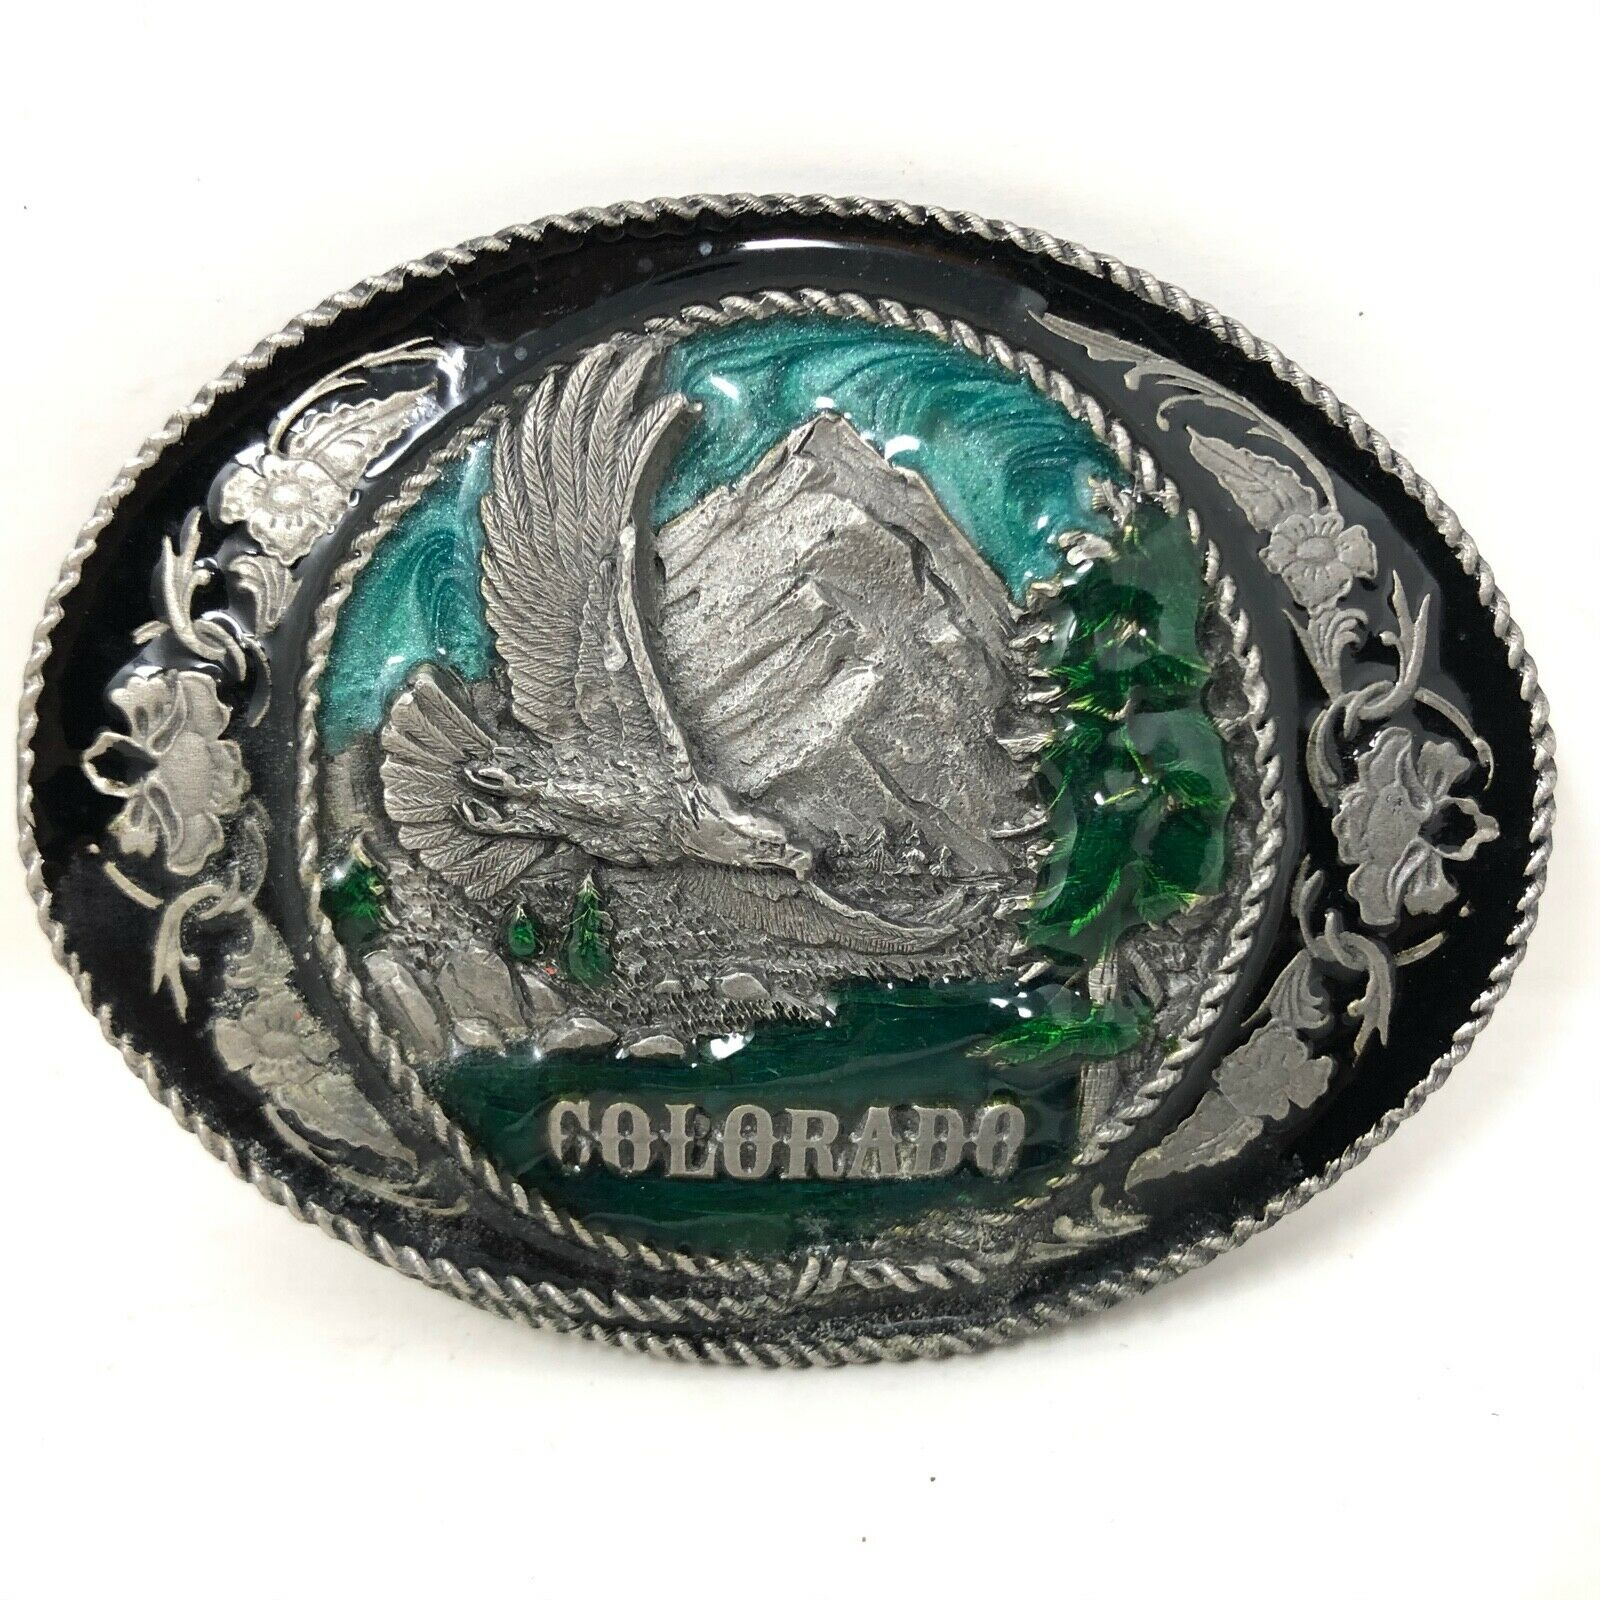 VTG Siskiyou Colorado Rocky Mountains Bald Eagle Soaring Belt Buckle USA Made CO